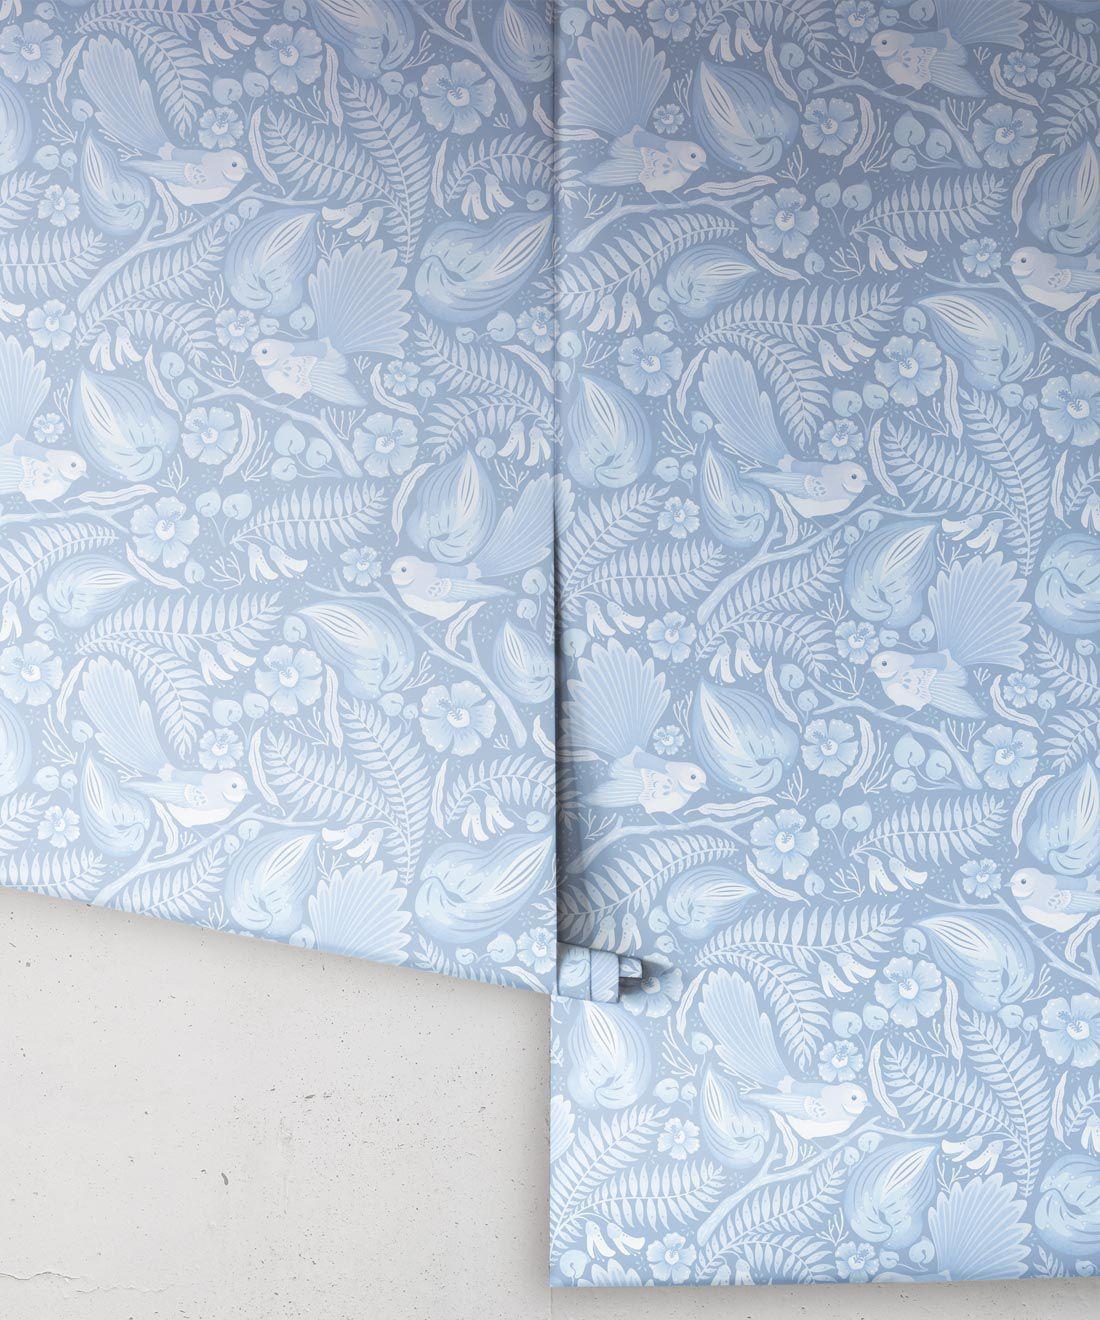 Faintails Wallpaper • New Zealand • Bird Wallpaper • Kowhai Tree • Kowhai Flowers • Light Blue Wallpaper • Ice Colorway • Wallpaper Drops